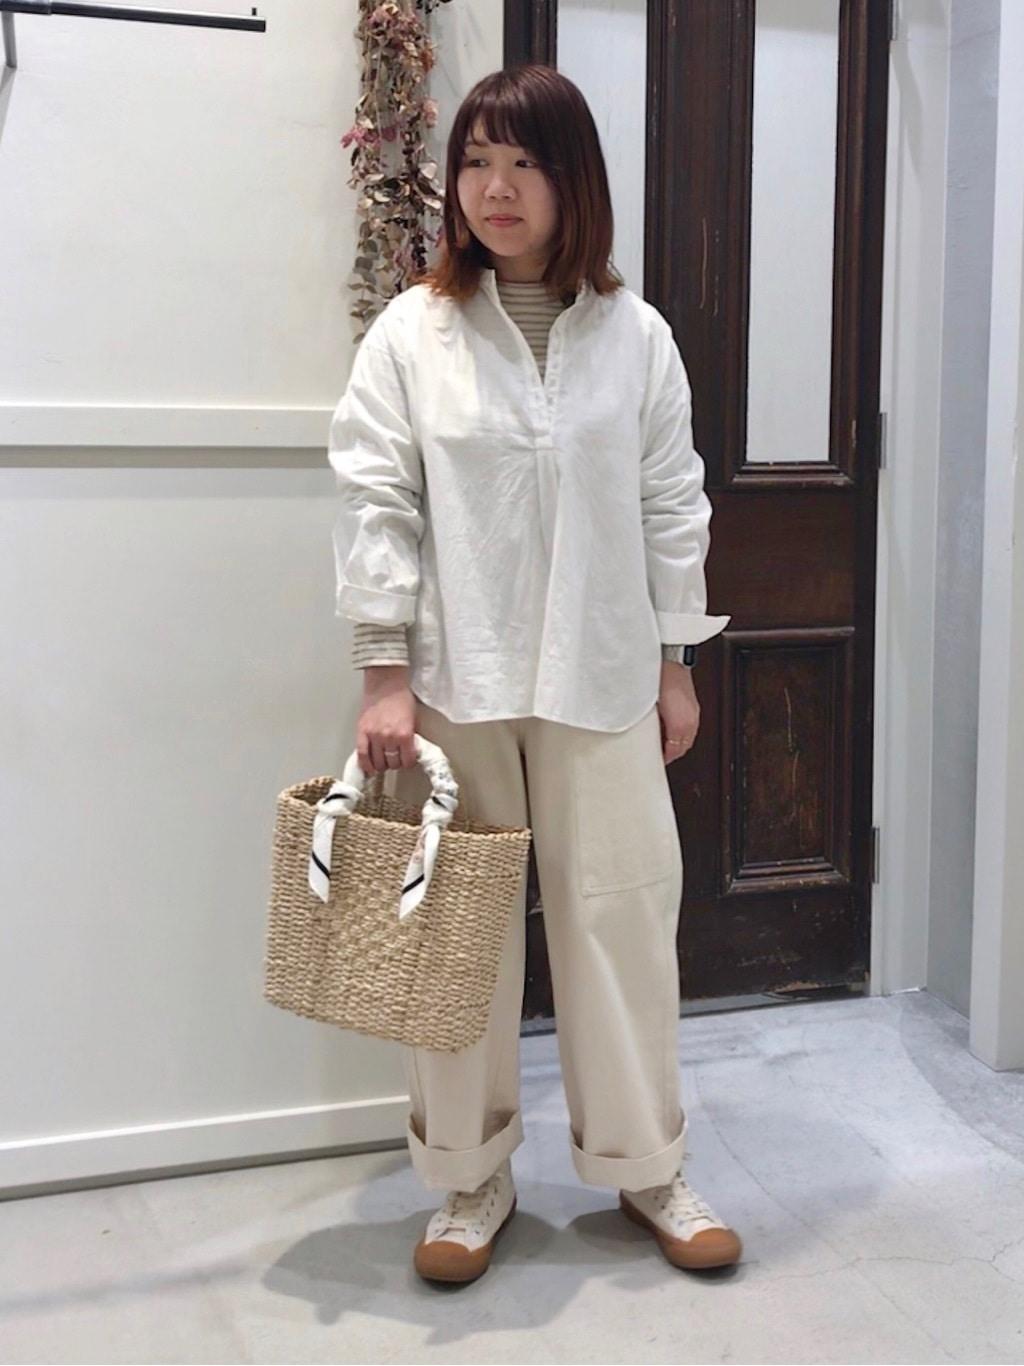 chambre de charme キラリナ京王吉祥寺 身長:155cm 2021.03.09